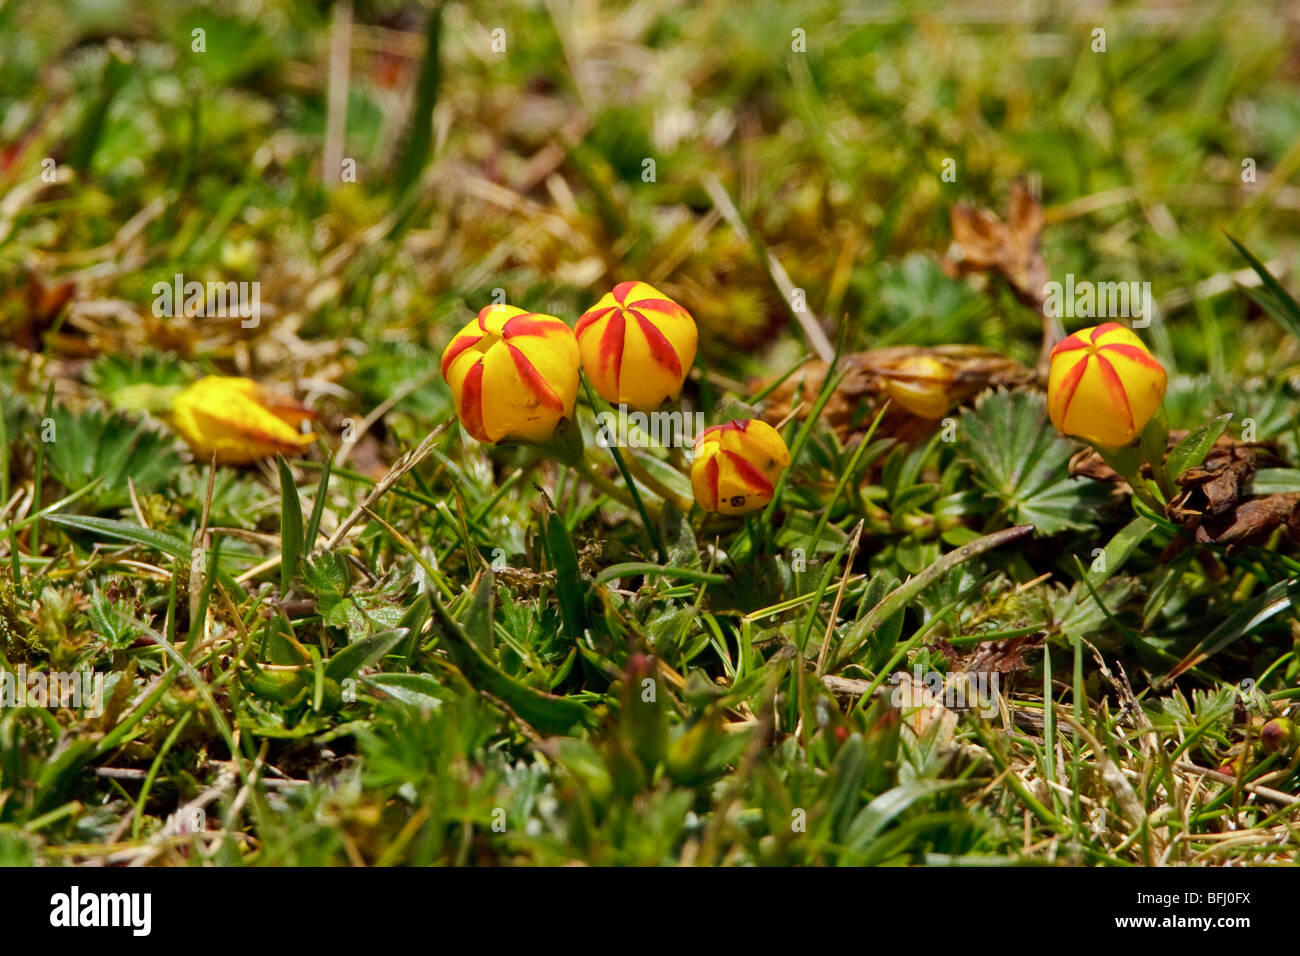 Paramo vegetation in Cajas National Park is southern Ecuador. - Stock Image